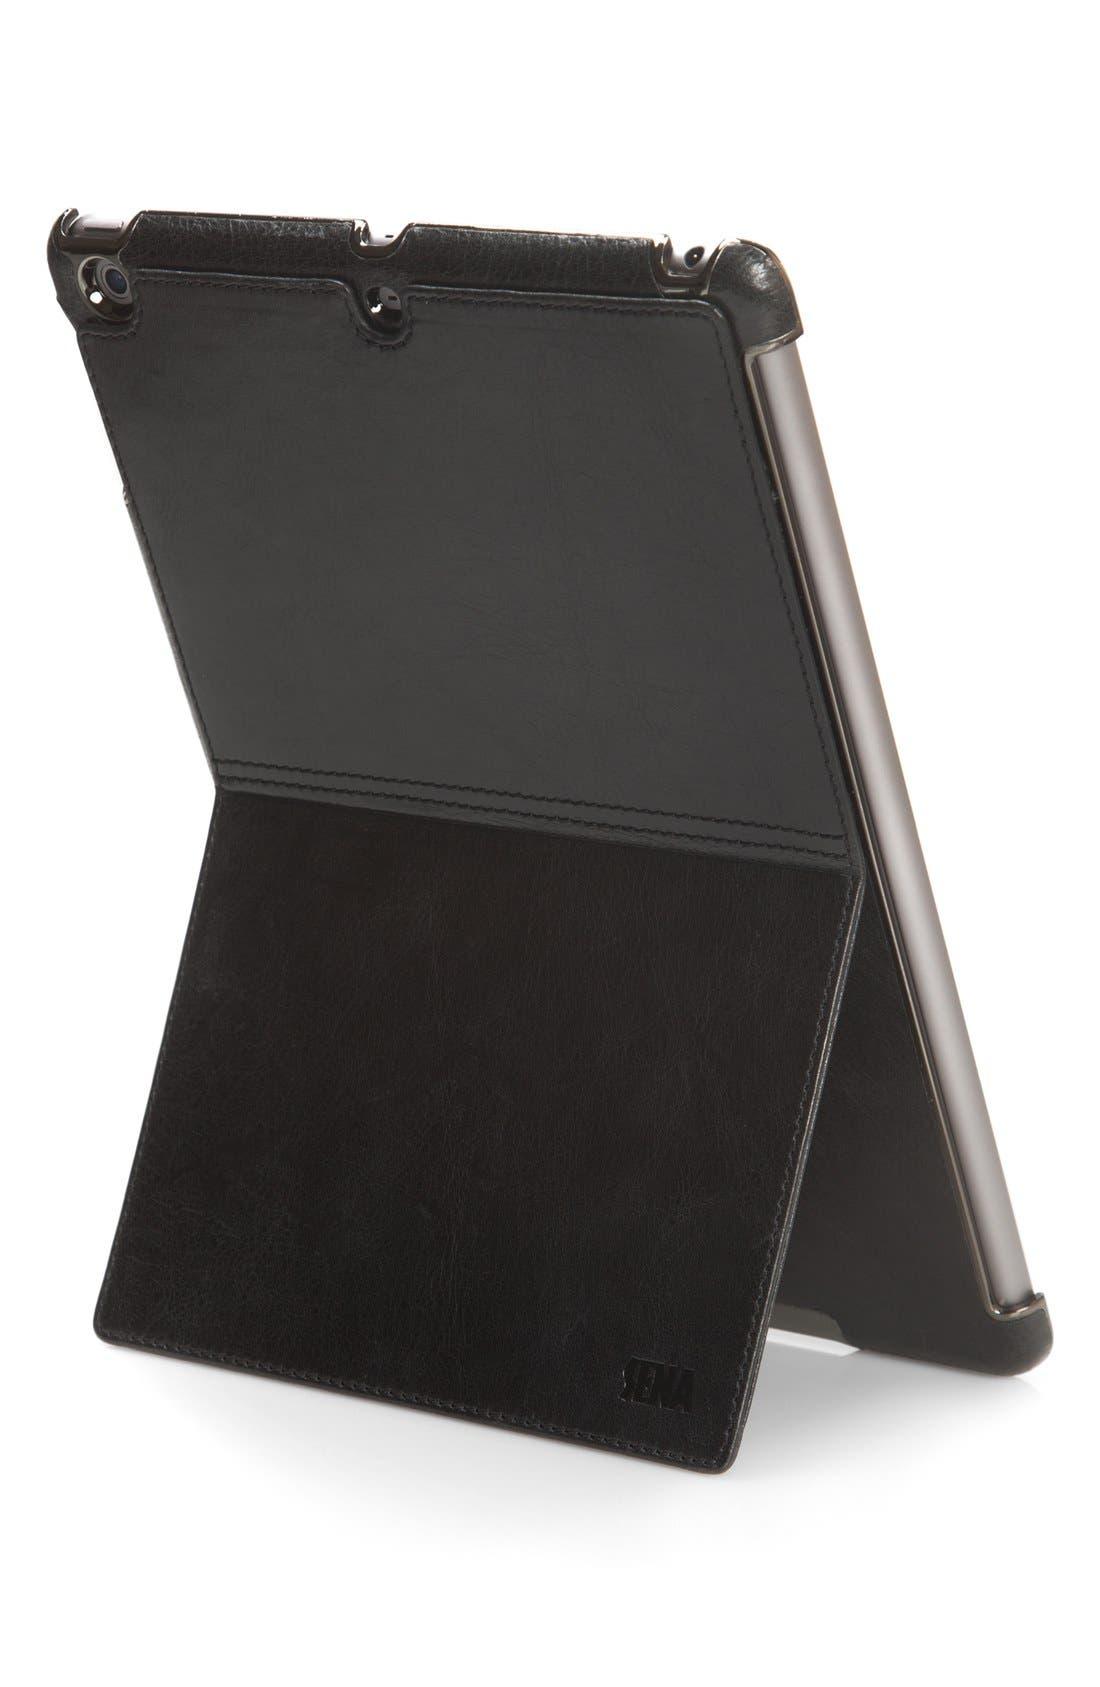 Sena 'Heritage' iPad Air Stand